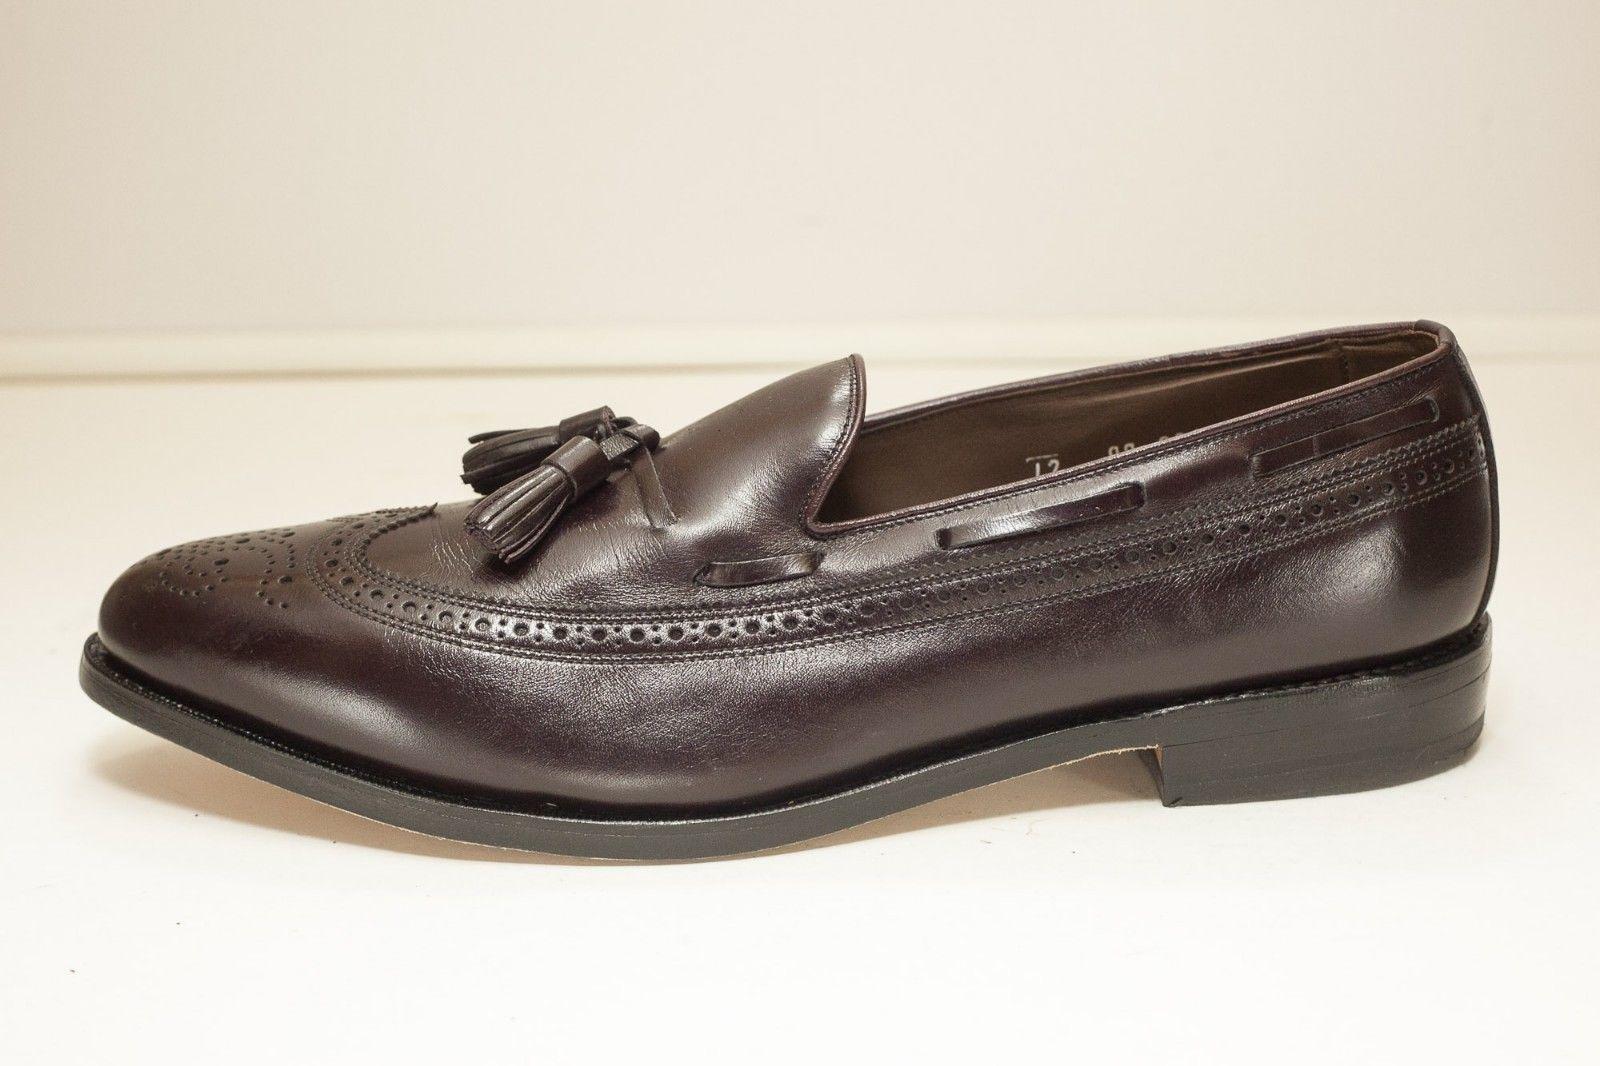 Allen Edmonds Manchester Size 12 AA Burgundy Wing Tip Tassel Loafer Men's